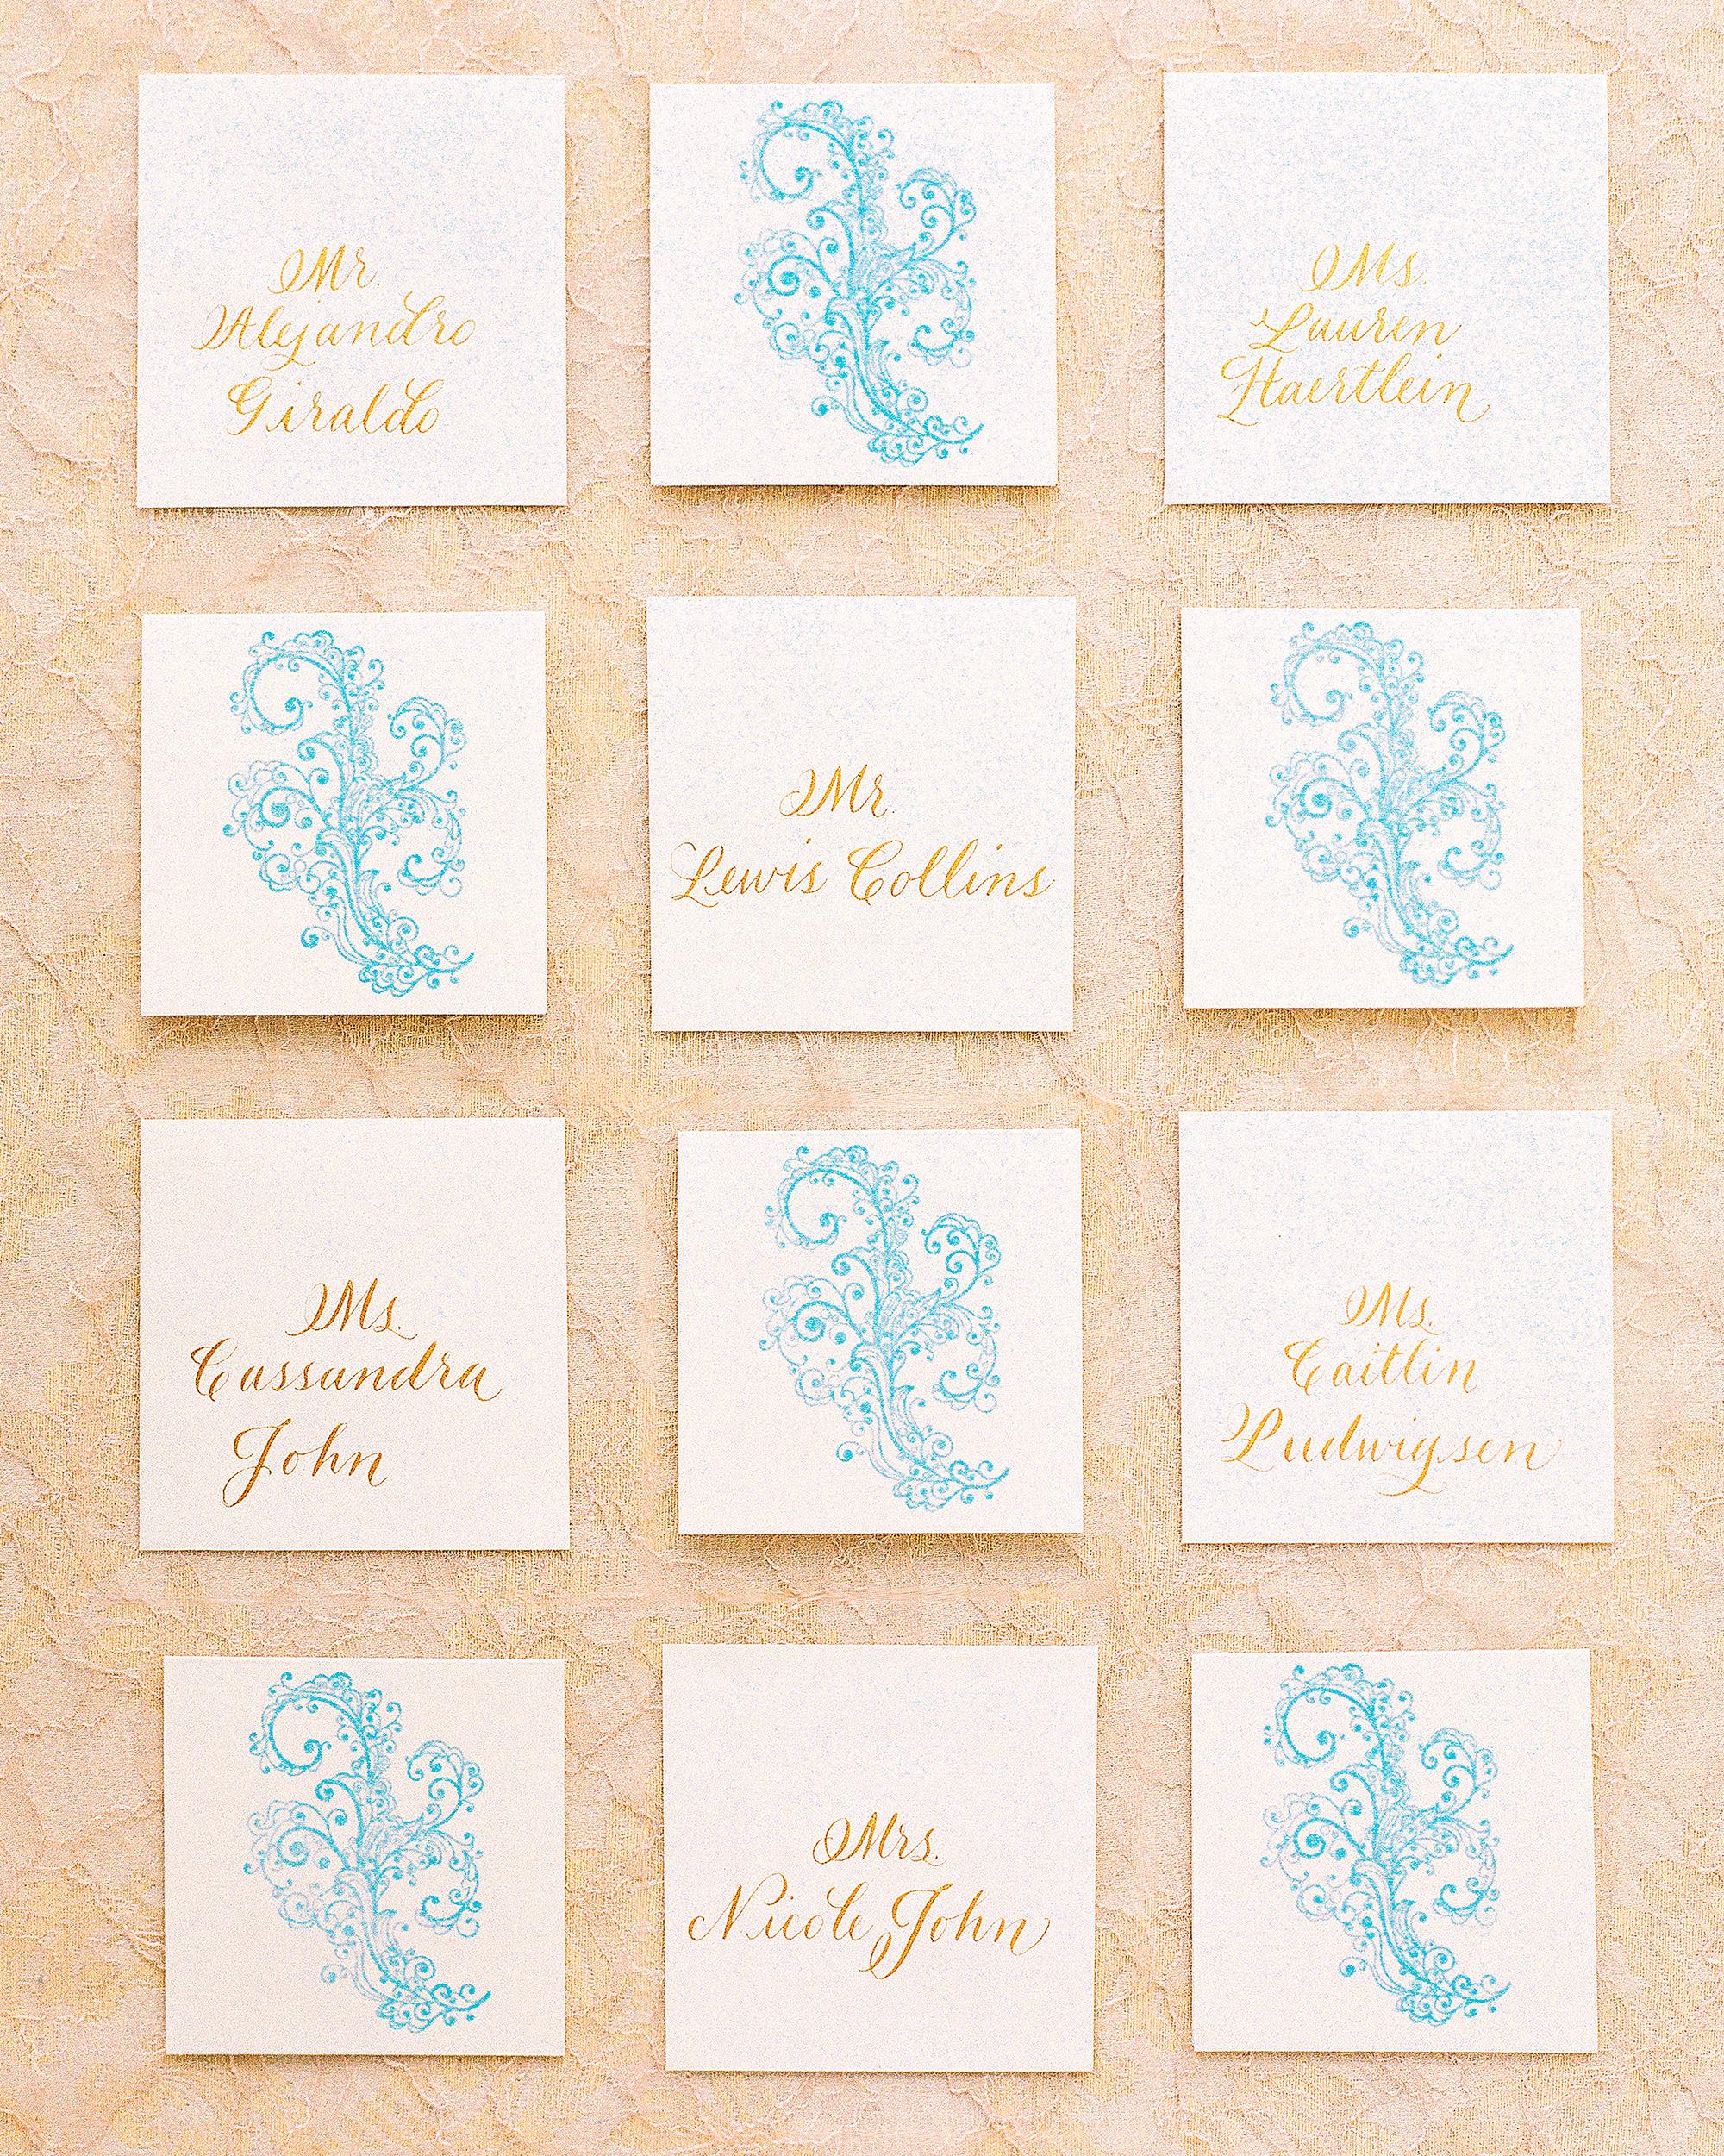 michelle-christopher-positano-italy-table-card-0056-s111681.jpg